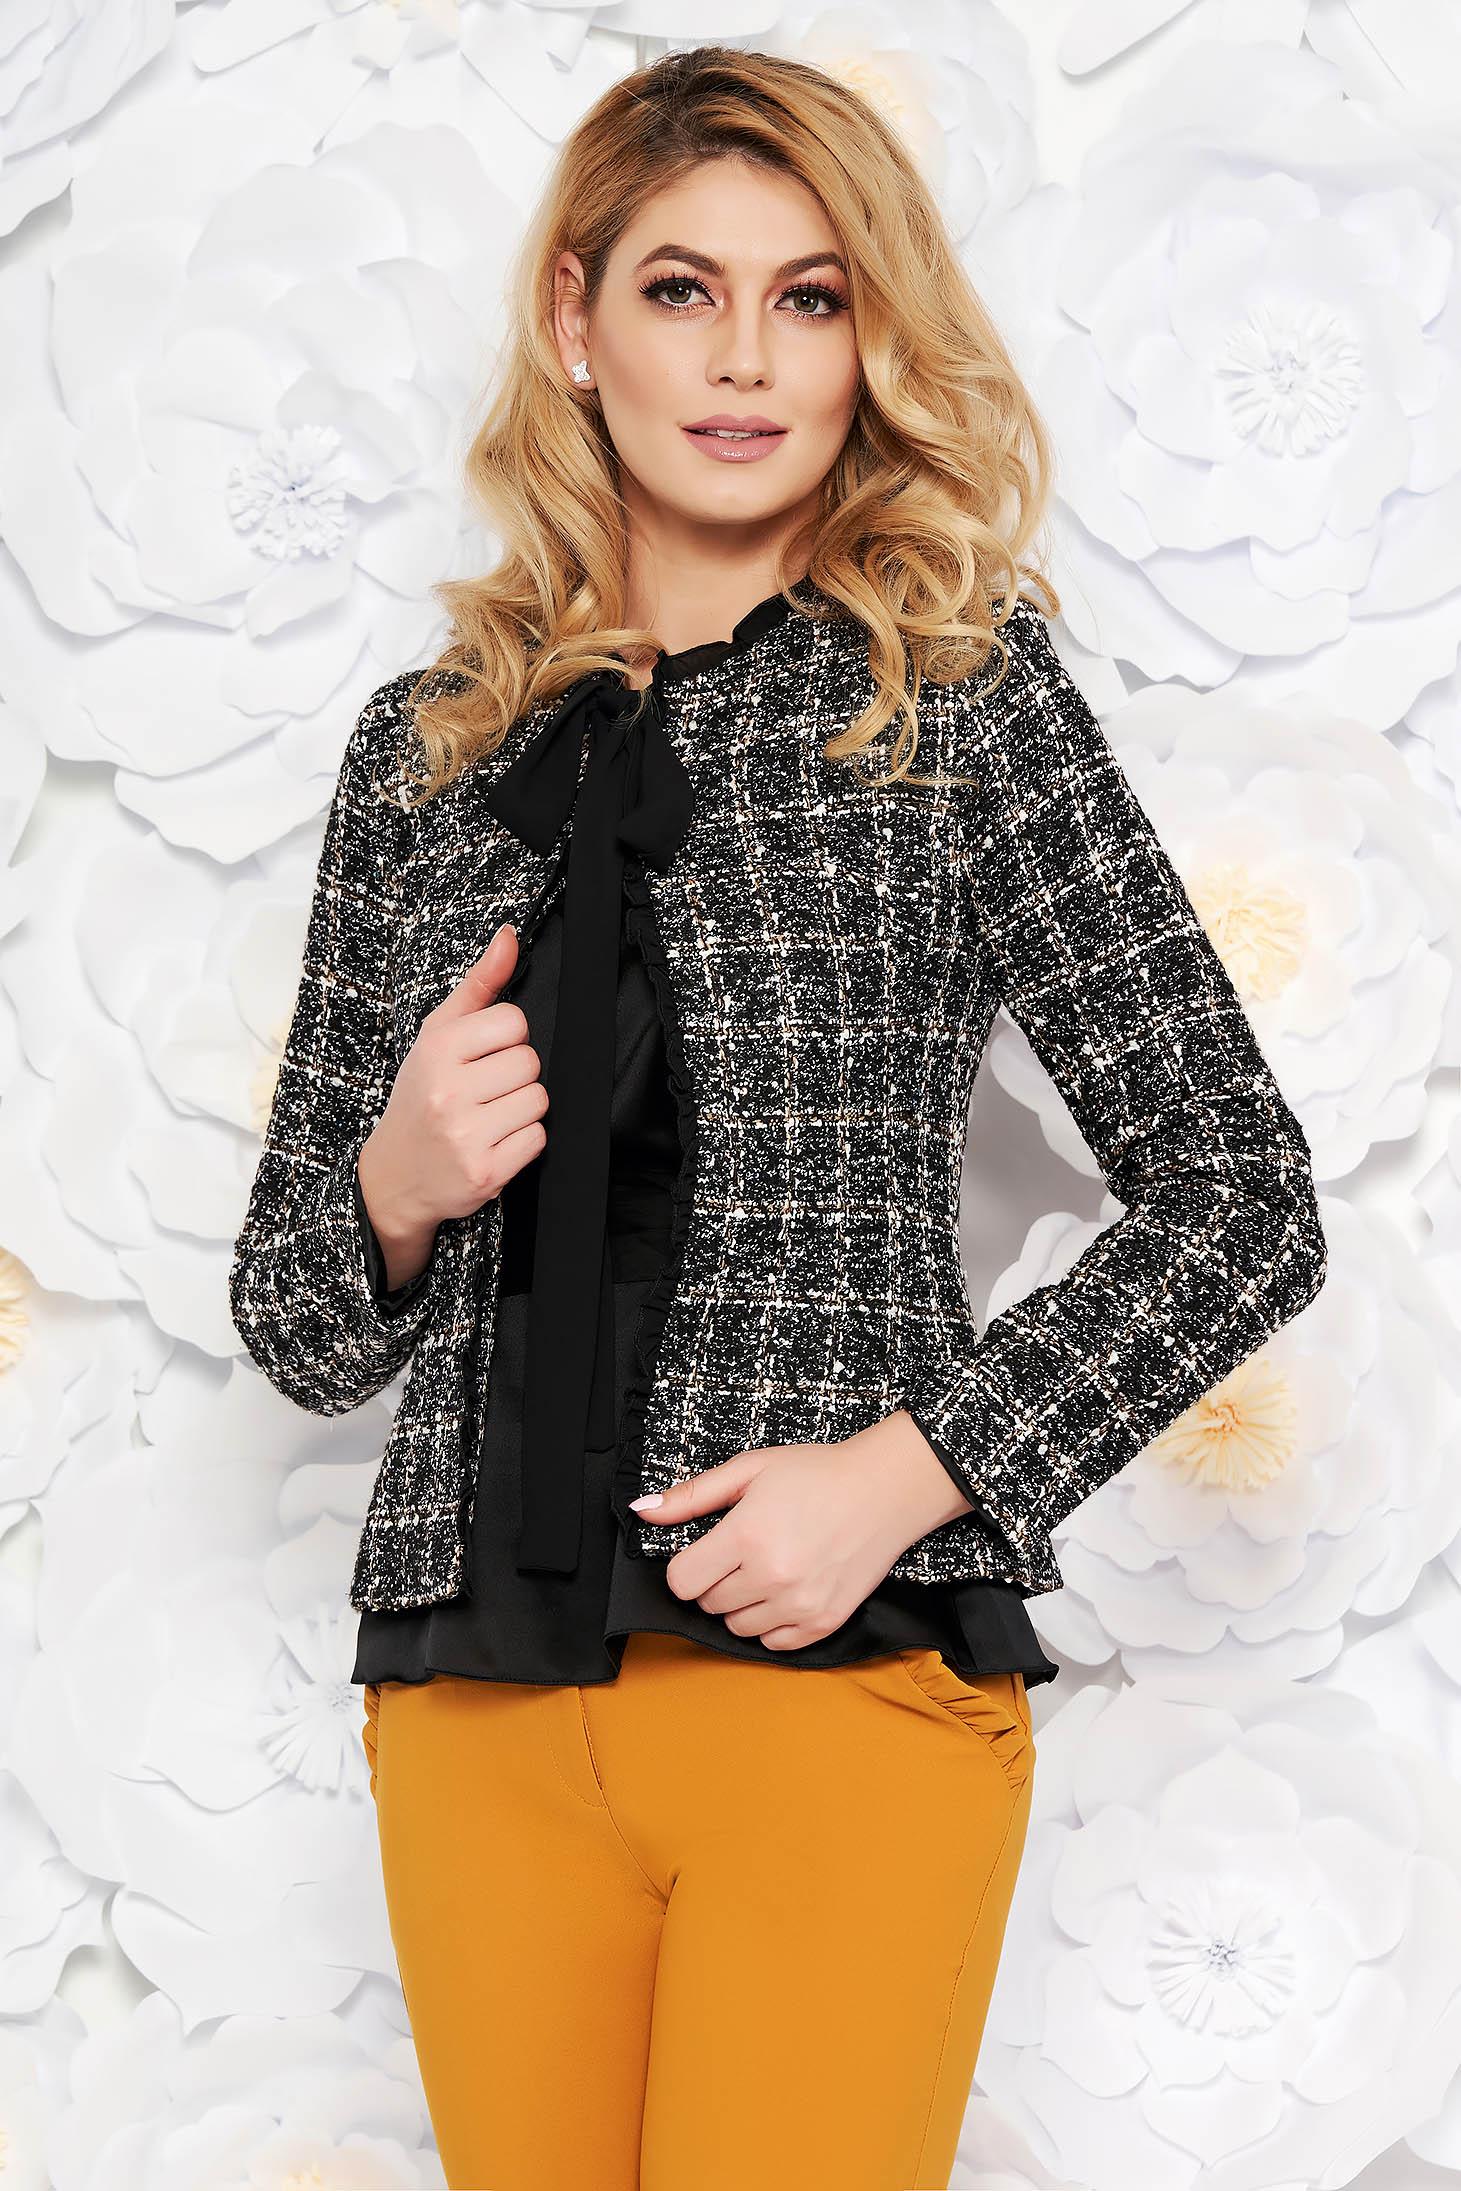 LaDonna black elegant wool jacket arched cut with inside lining with sequin embellished details